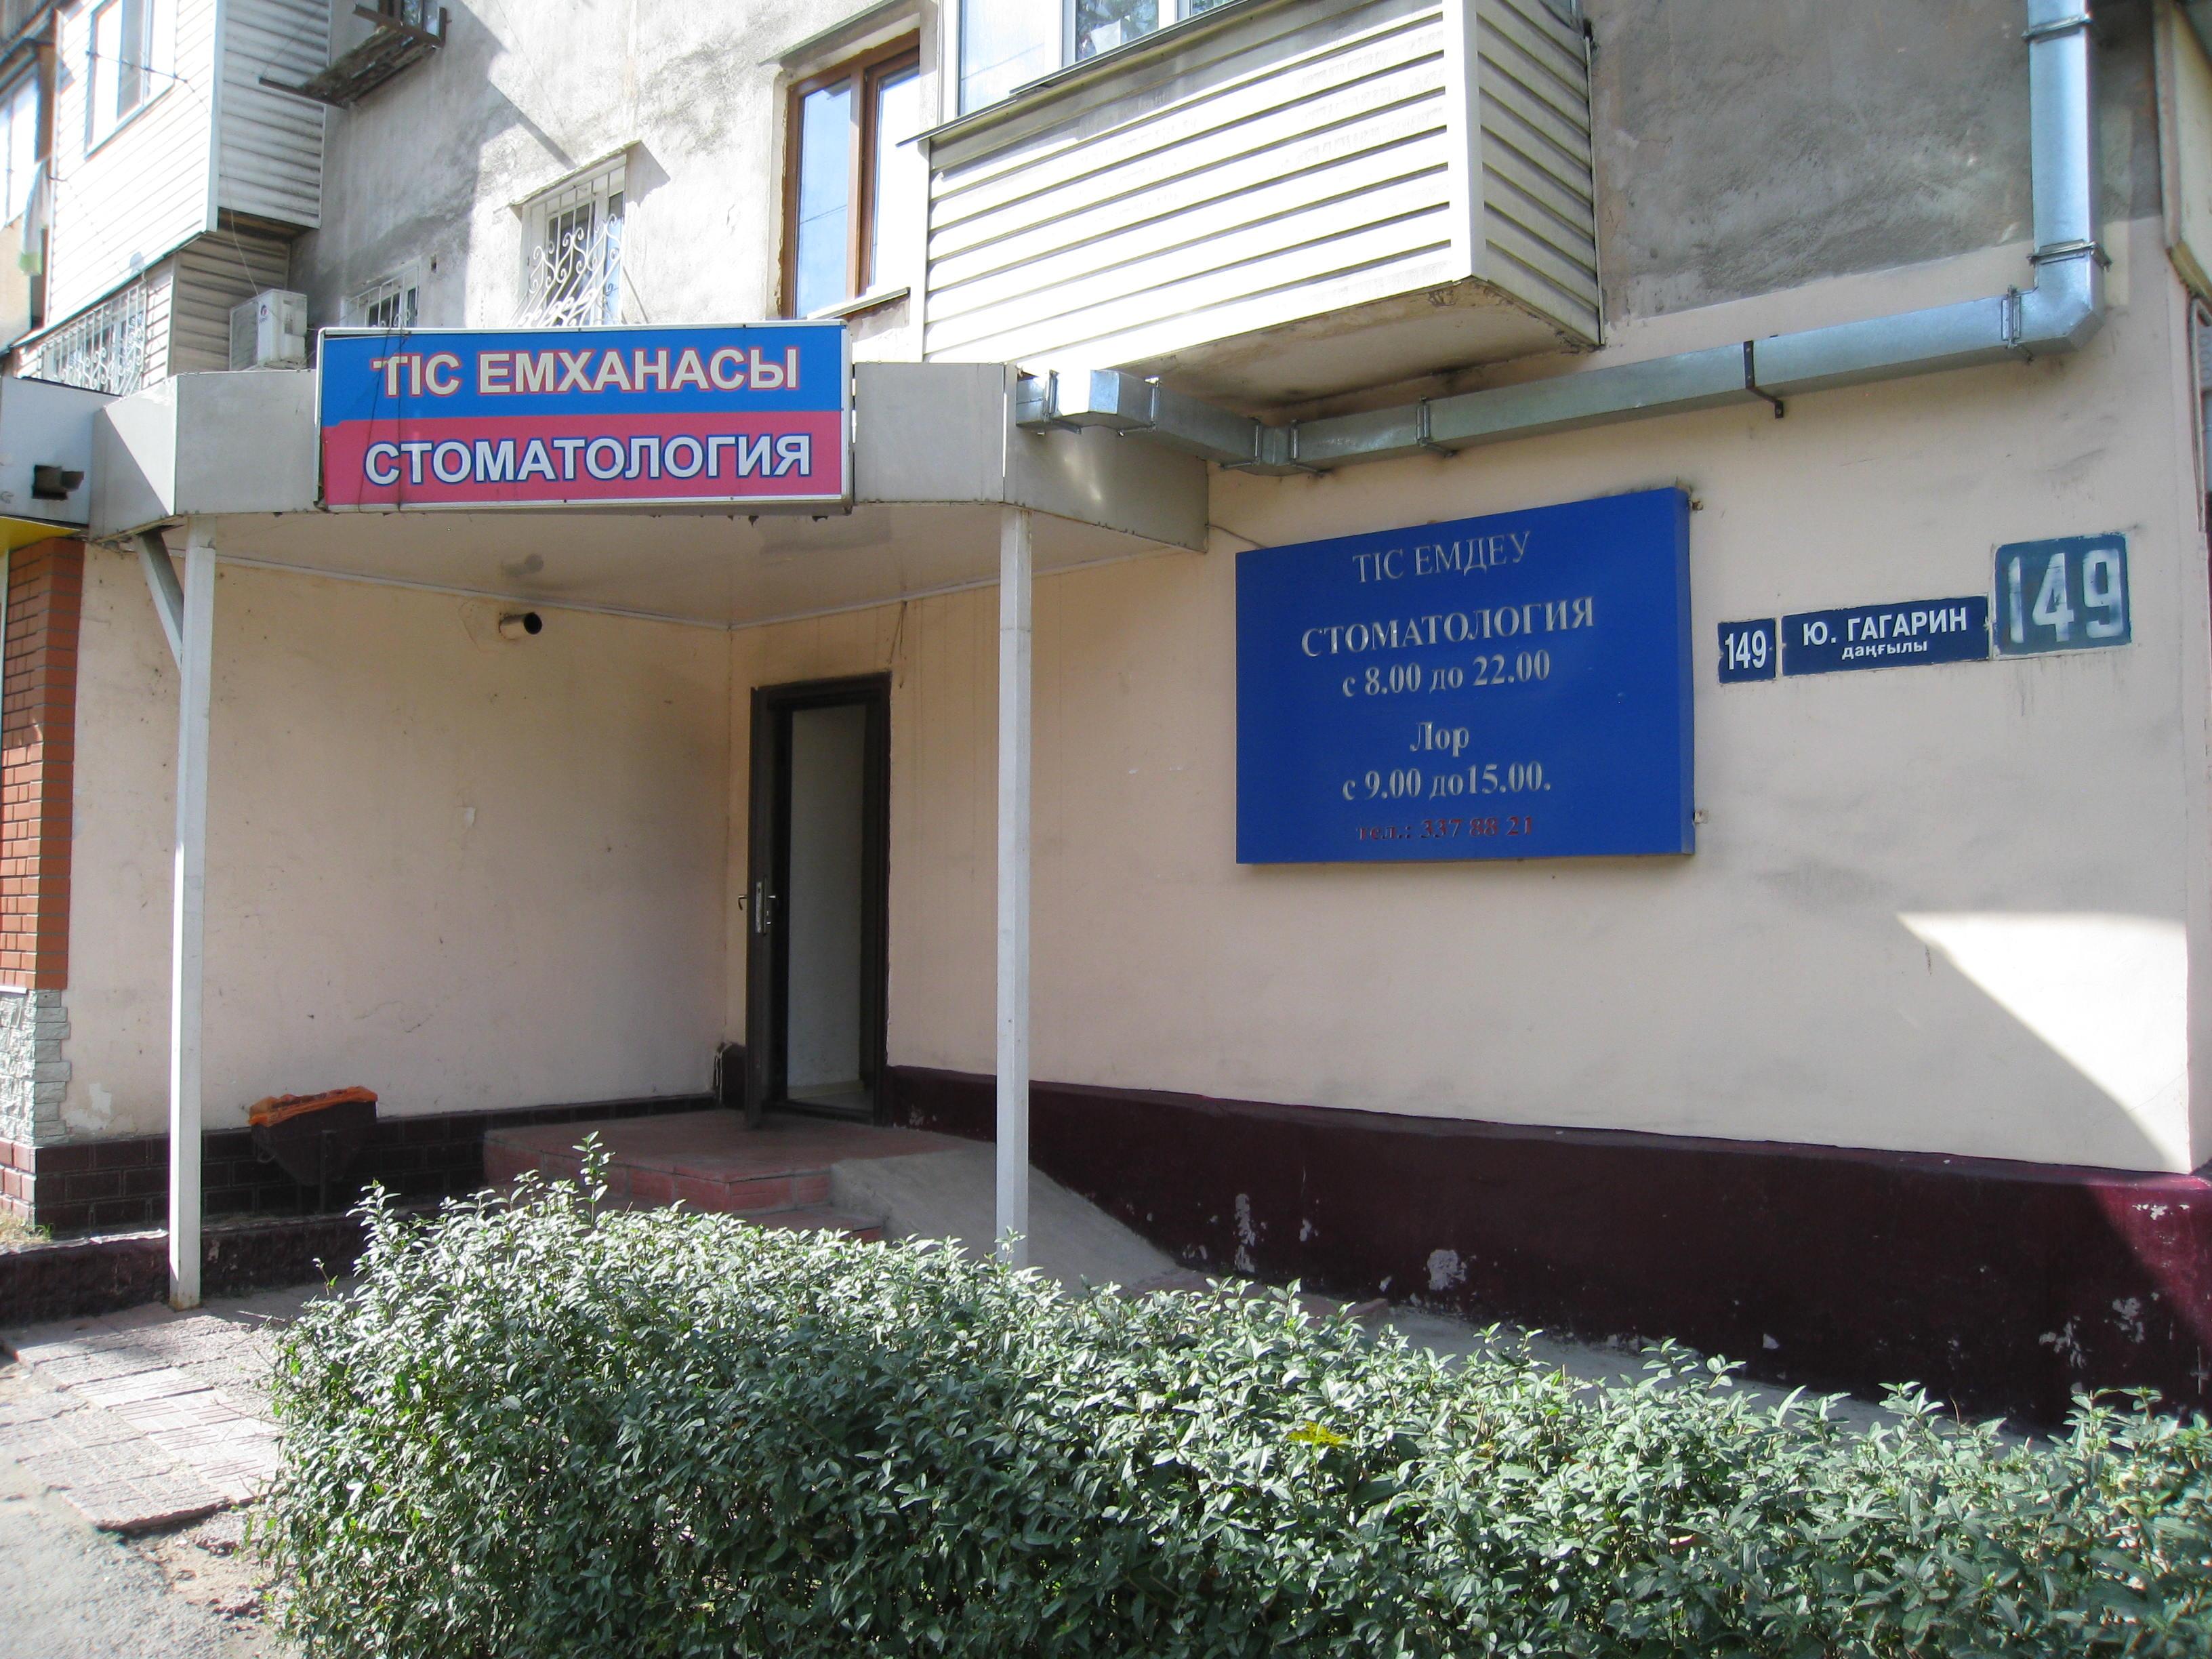 Стоматология на Гагарина 149